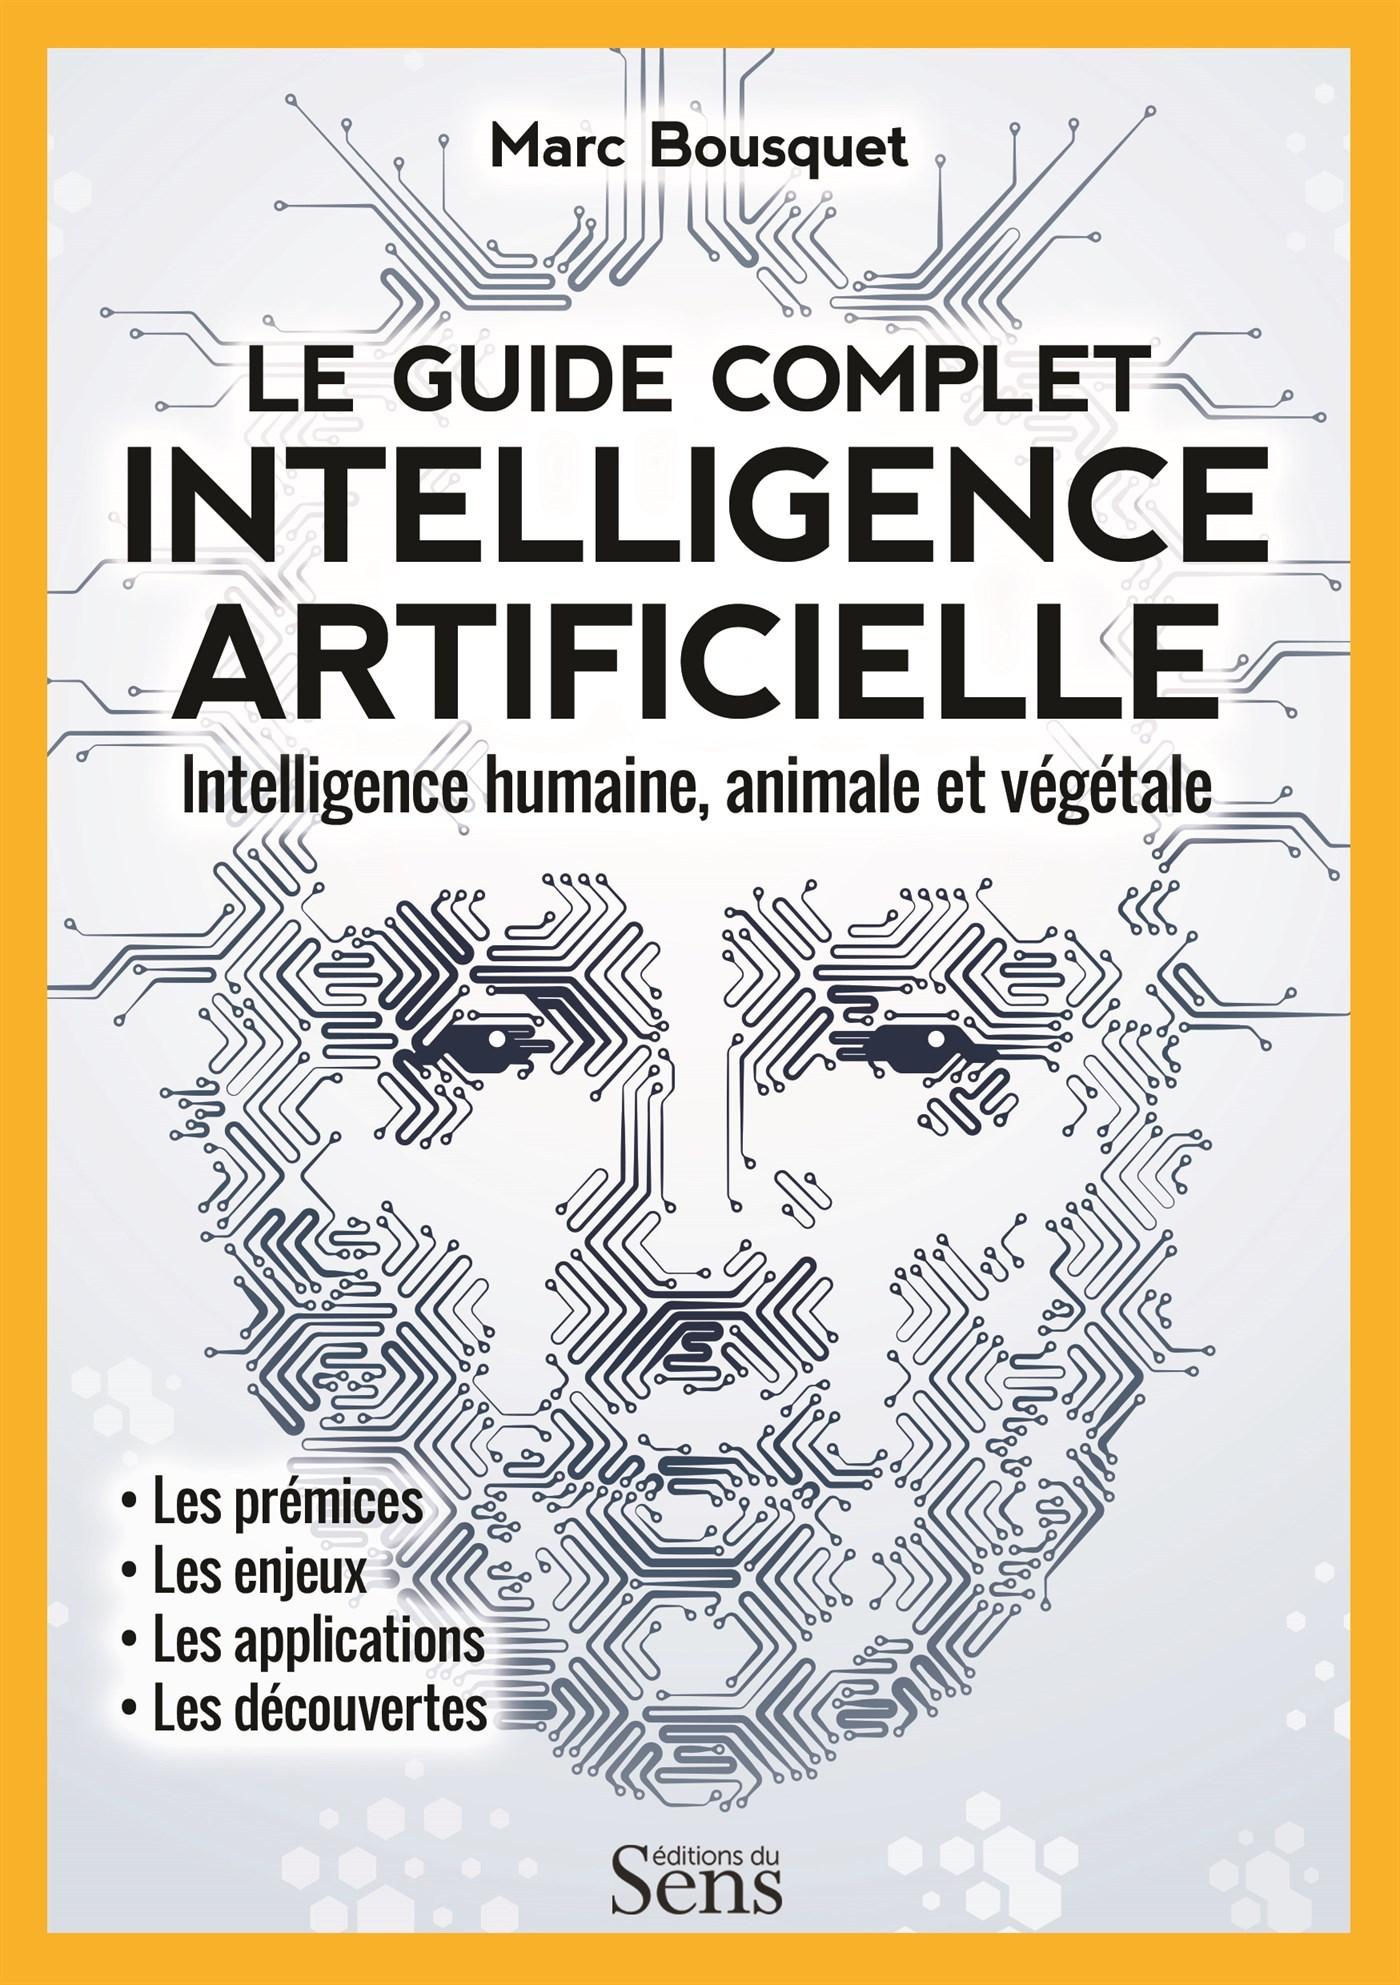 INTELLIGENCE ARTIFICIELLE. INTELLIGENCE HUMAINE, ANIMALE ET VEGETALE